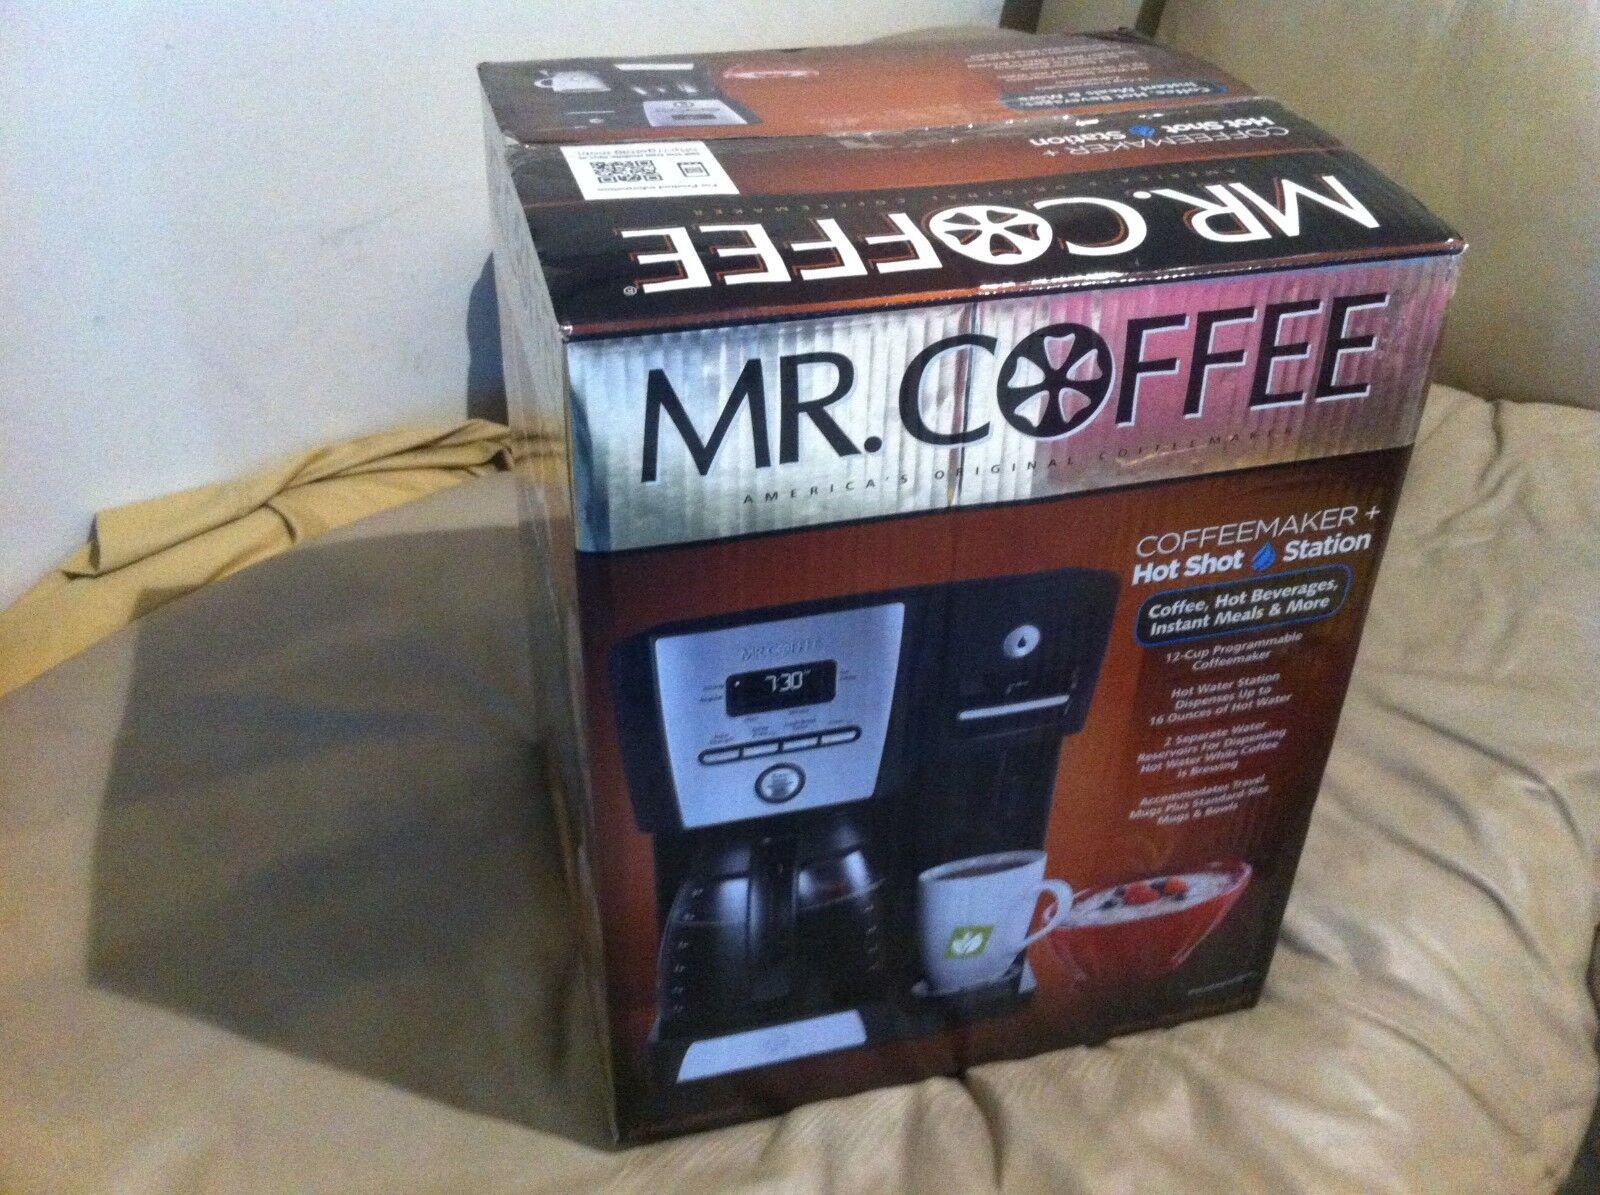 New Mr. Coffee BVMC-DMX85 12-Cup Programmable Coffeemaker & Hot Water Dispenser